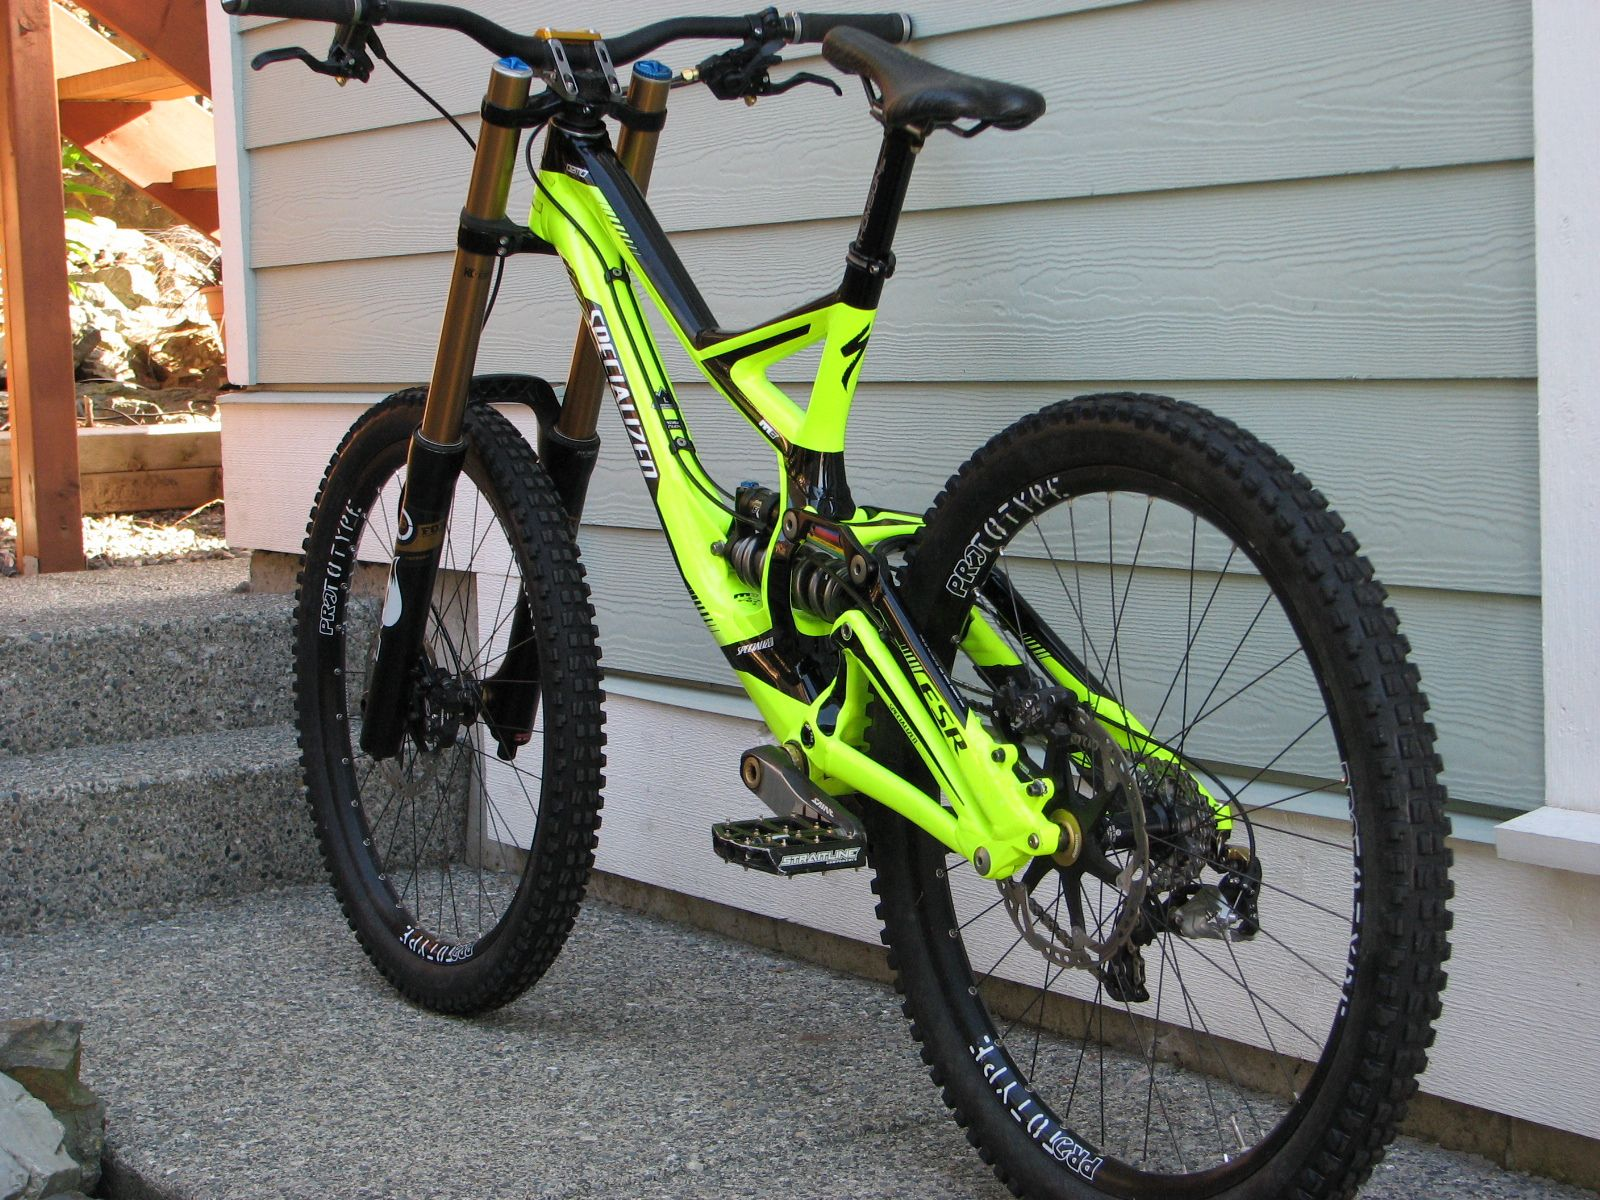 Pin By Mauricio Torres On Mtb Downhill Mtb Bike Mountain Downhill Bike Bicycle Mountain Bike